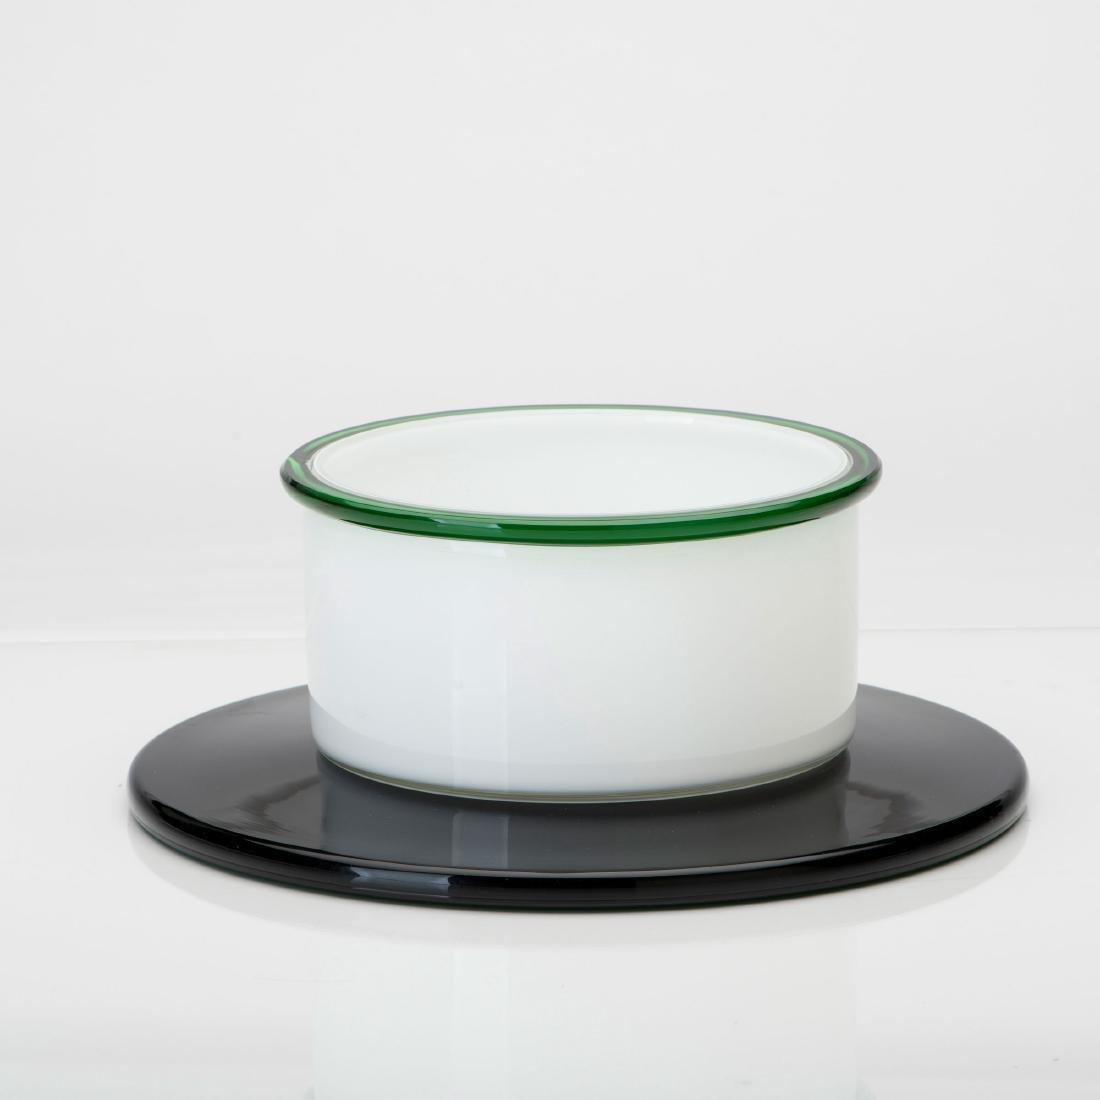 'Dogaressa' bowl, 1974 - 2